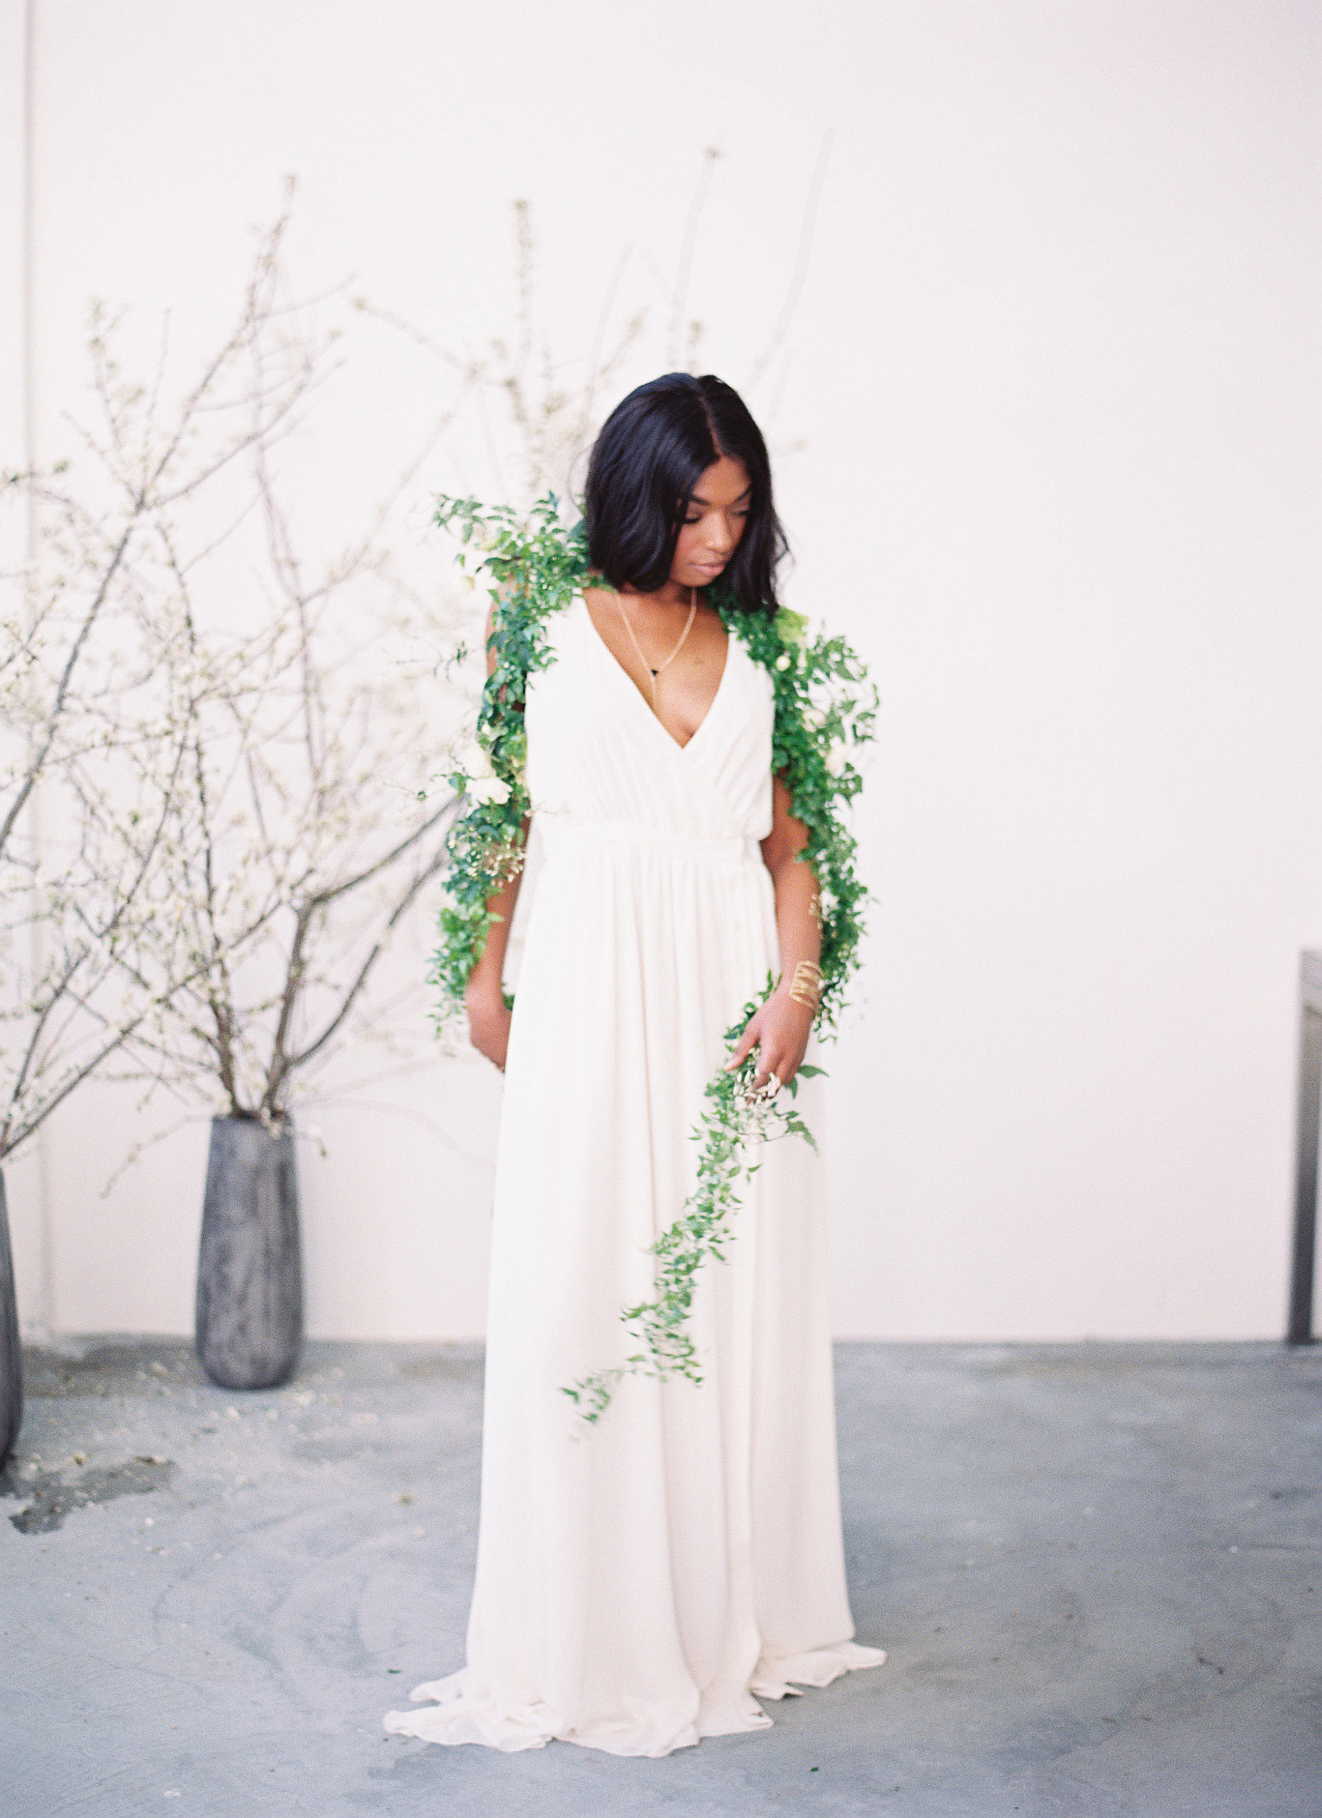 Floralessence-Esmeraldafranco-54.JPG